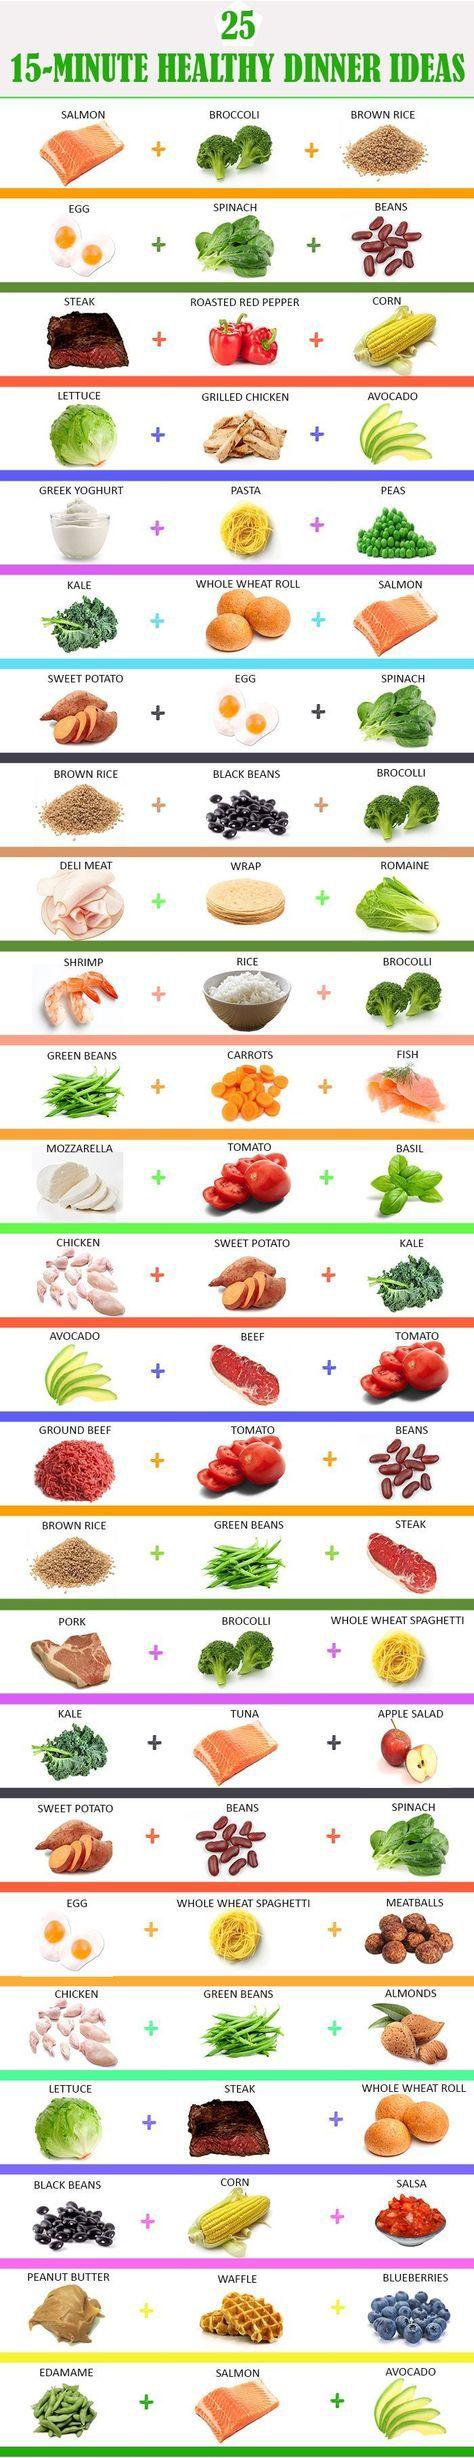 Eat healthy and drink apple cider vinegar for optimal health.